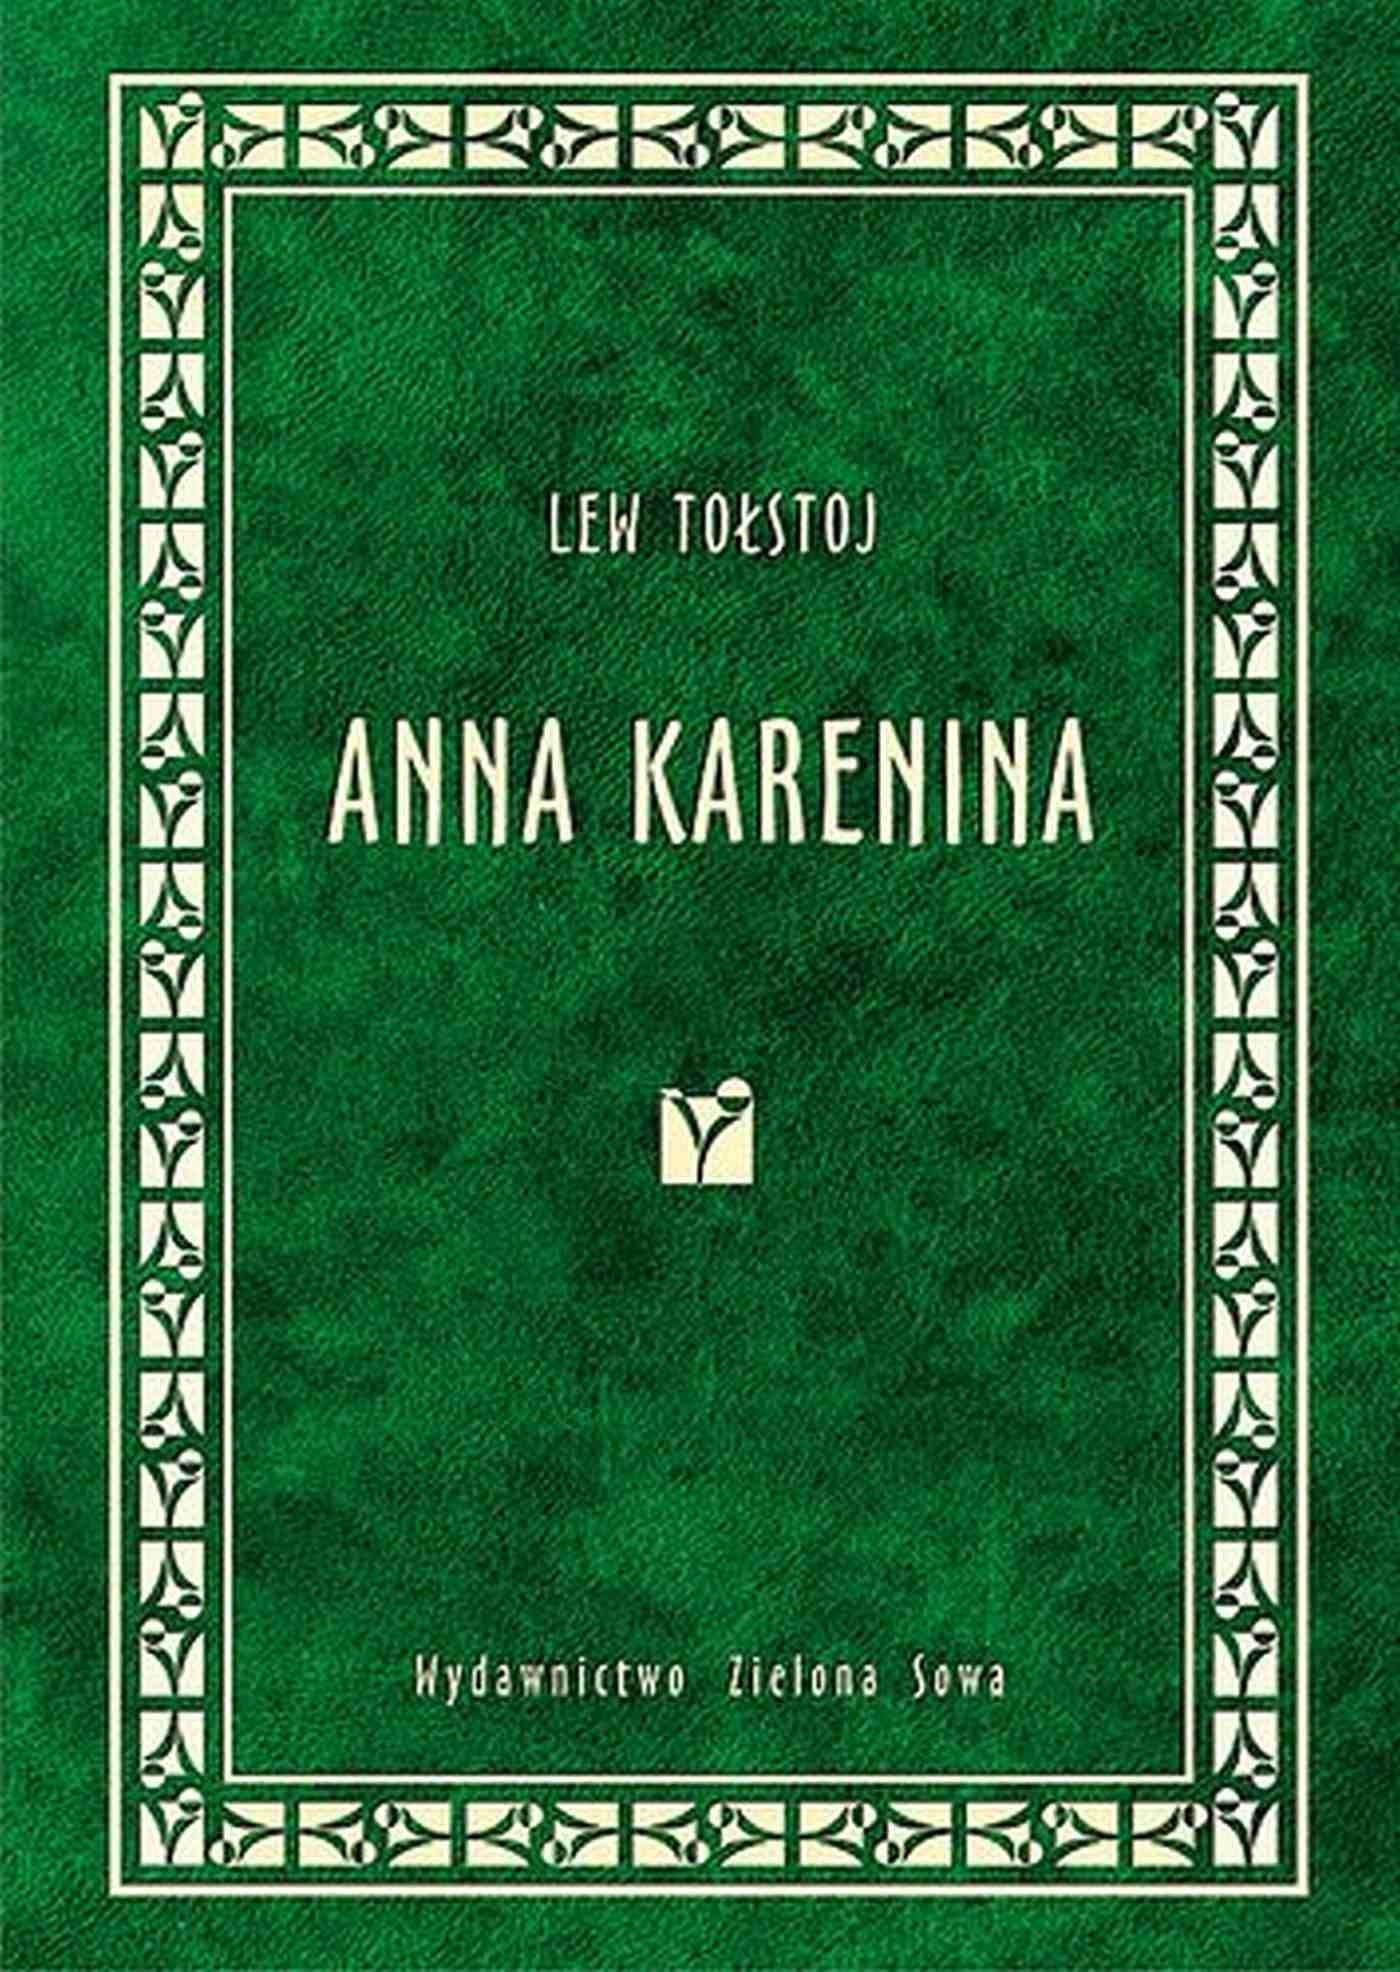 Anna Karenina - Ebook (Książka EPUB) do pobrania w formacie EPUB